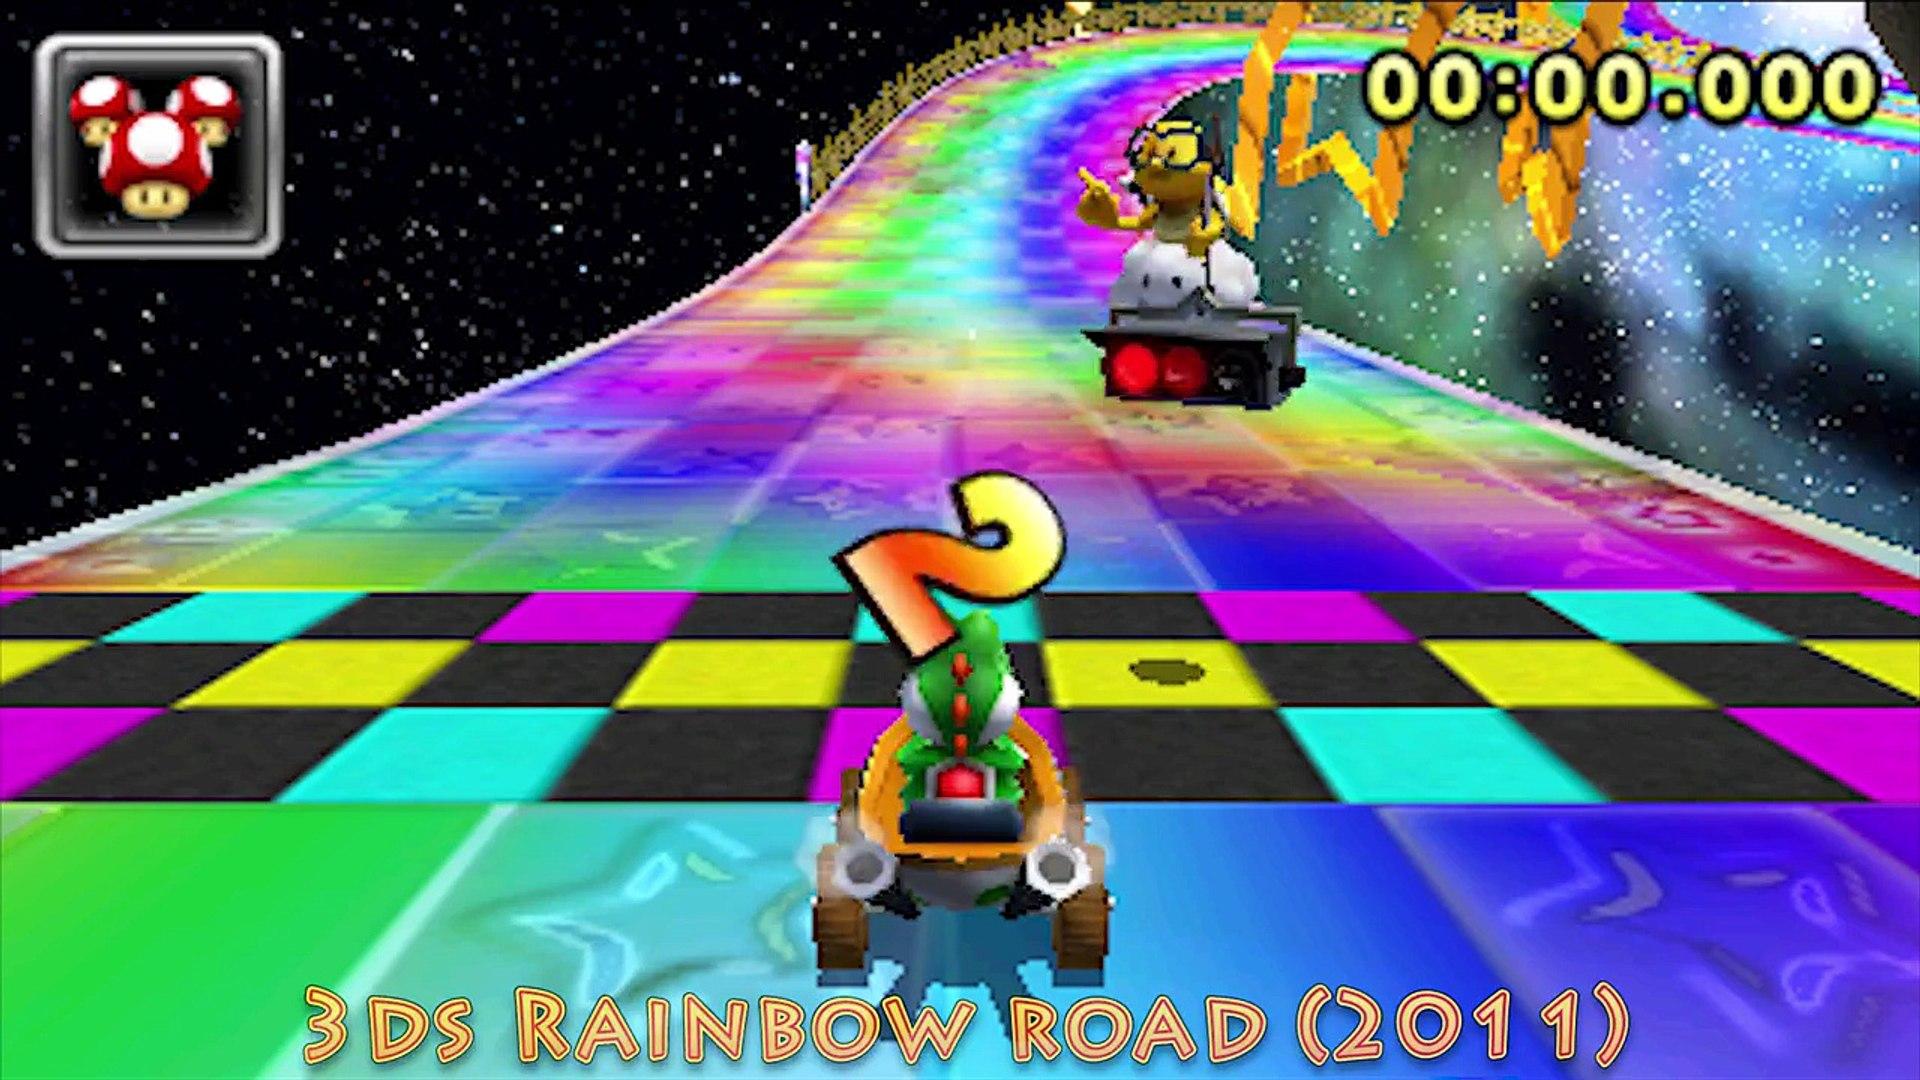 Mario Kart Rainbow Road 1992 To 2015 Generations 4k Video